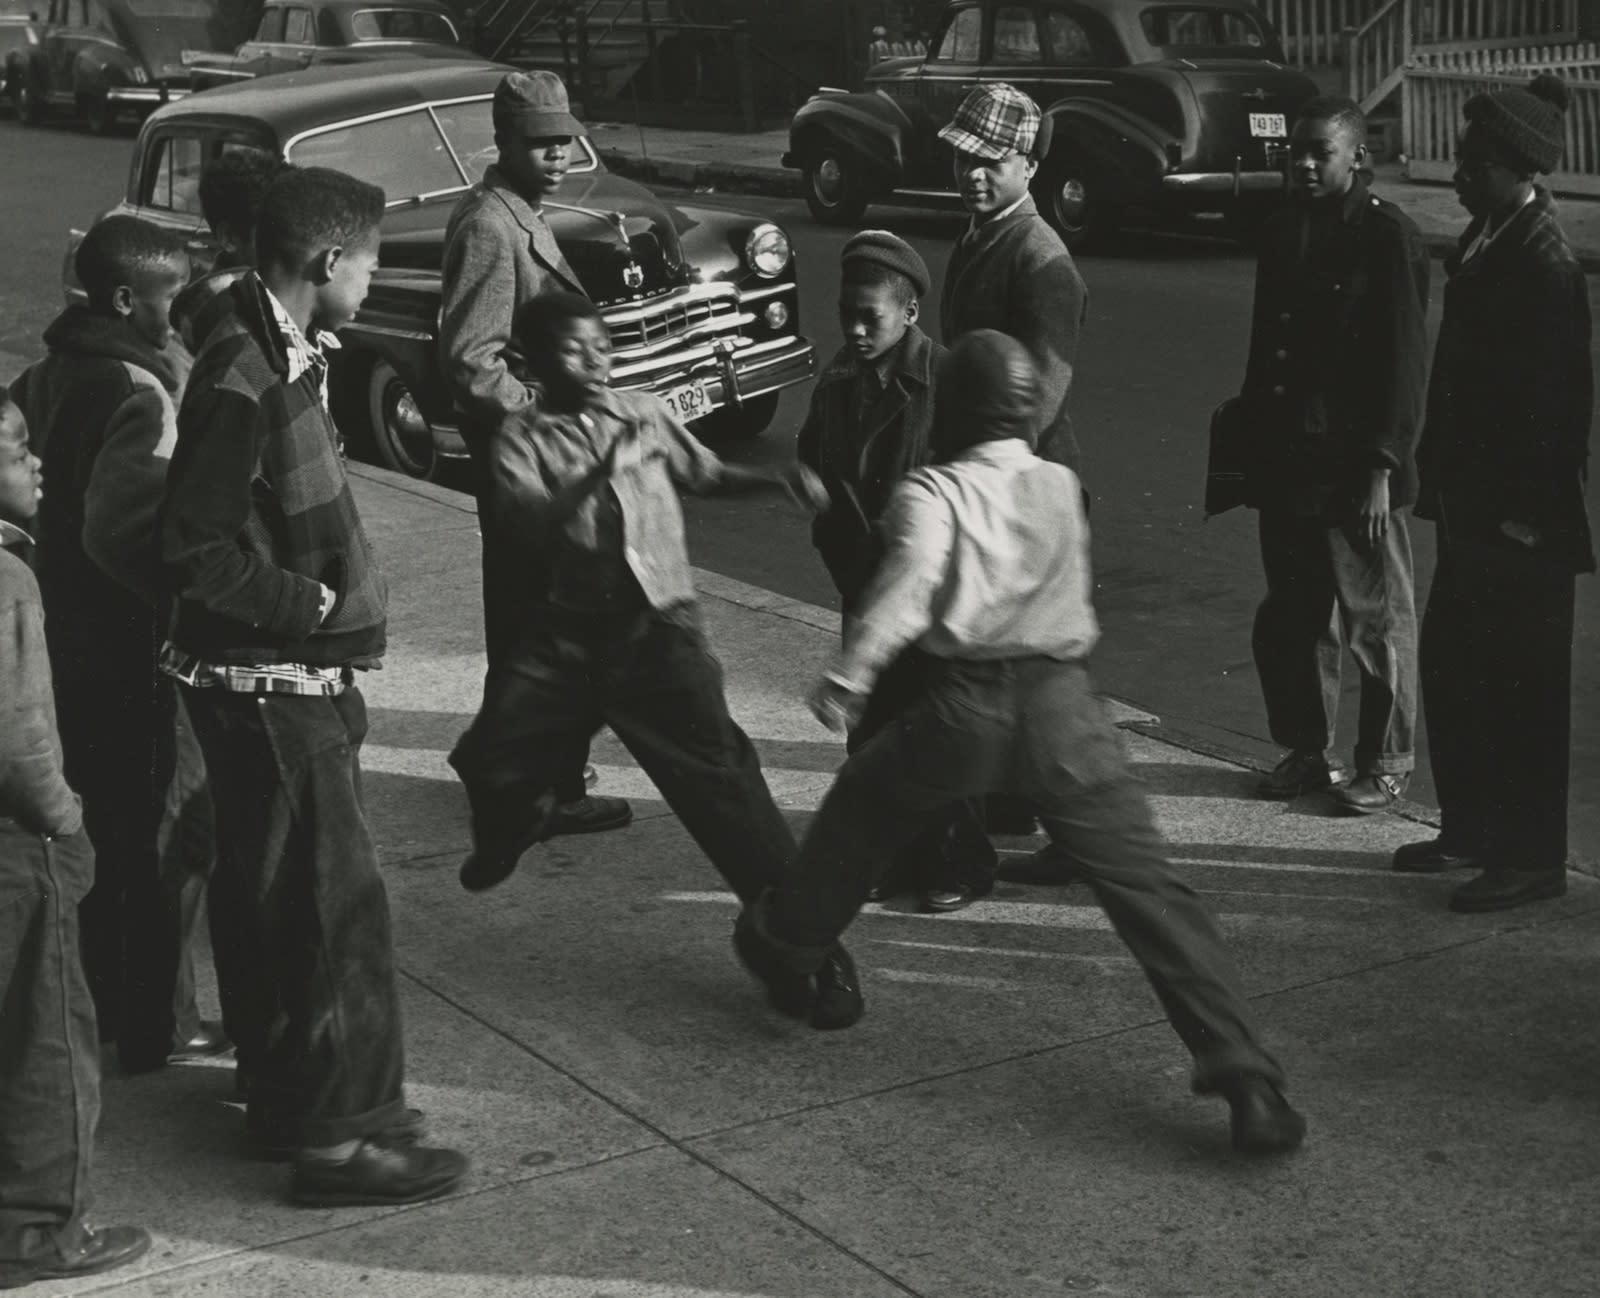 Marvin E. Newman, Children Fighting in Street, Chicago, 1950